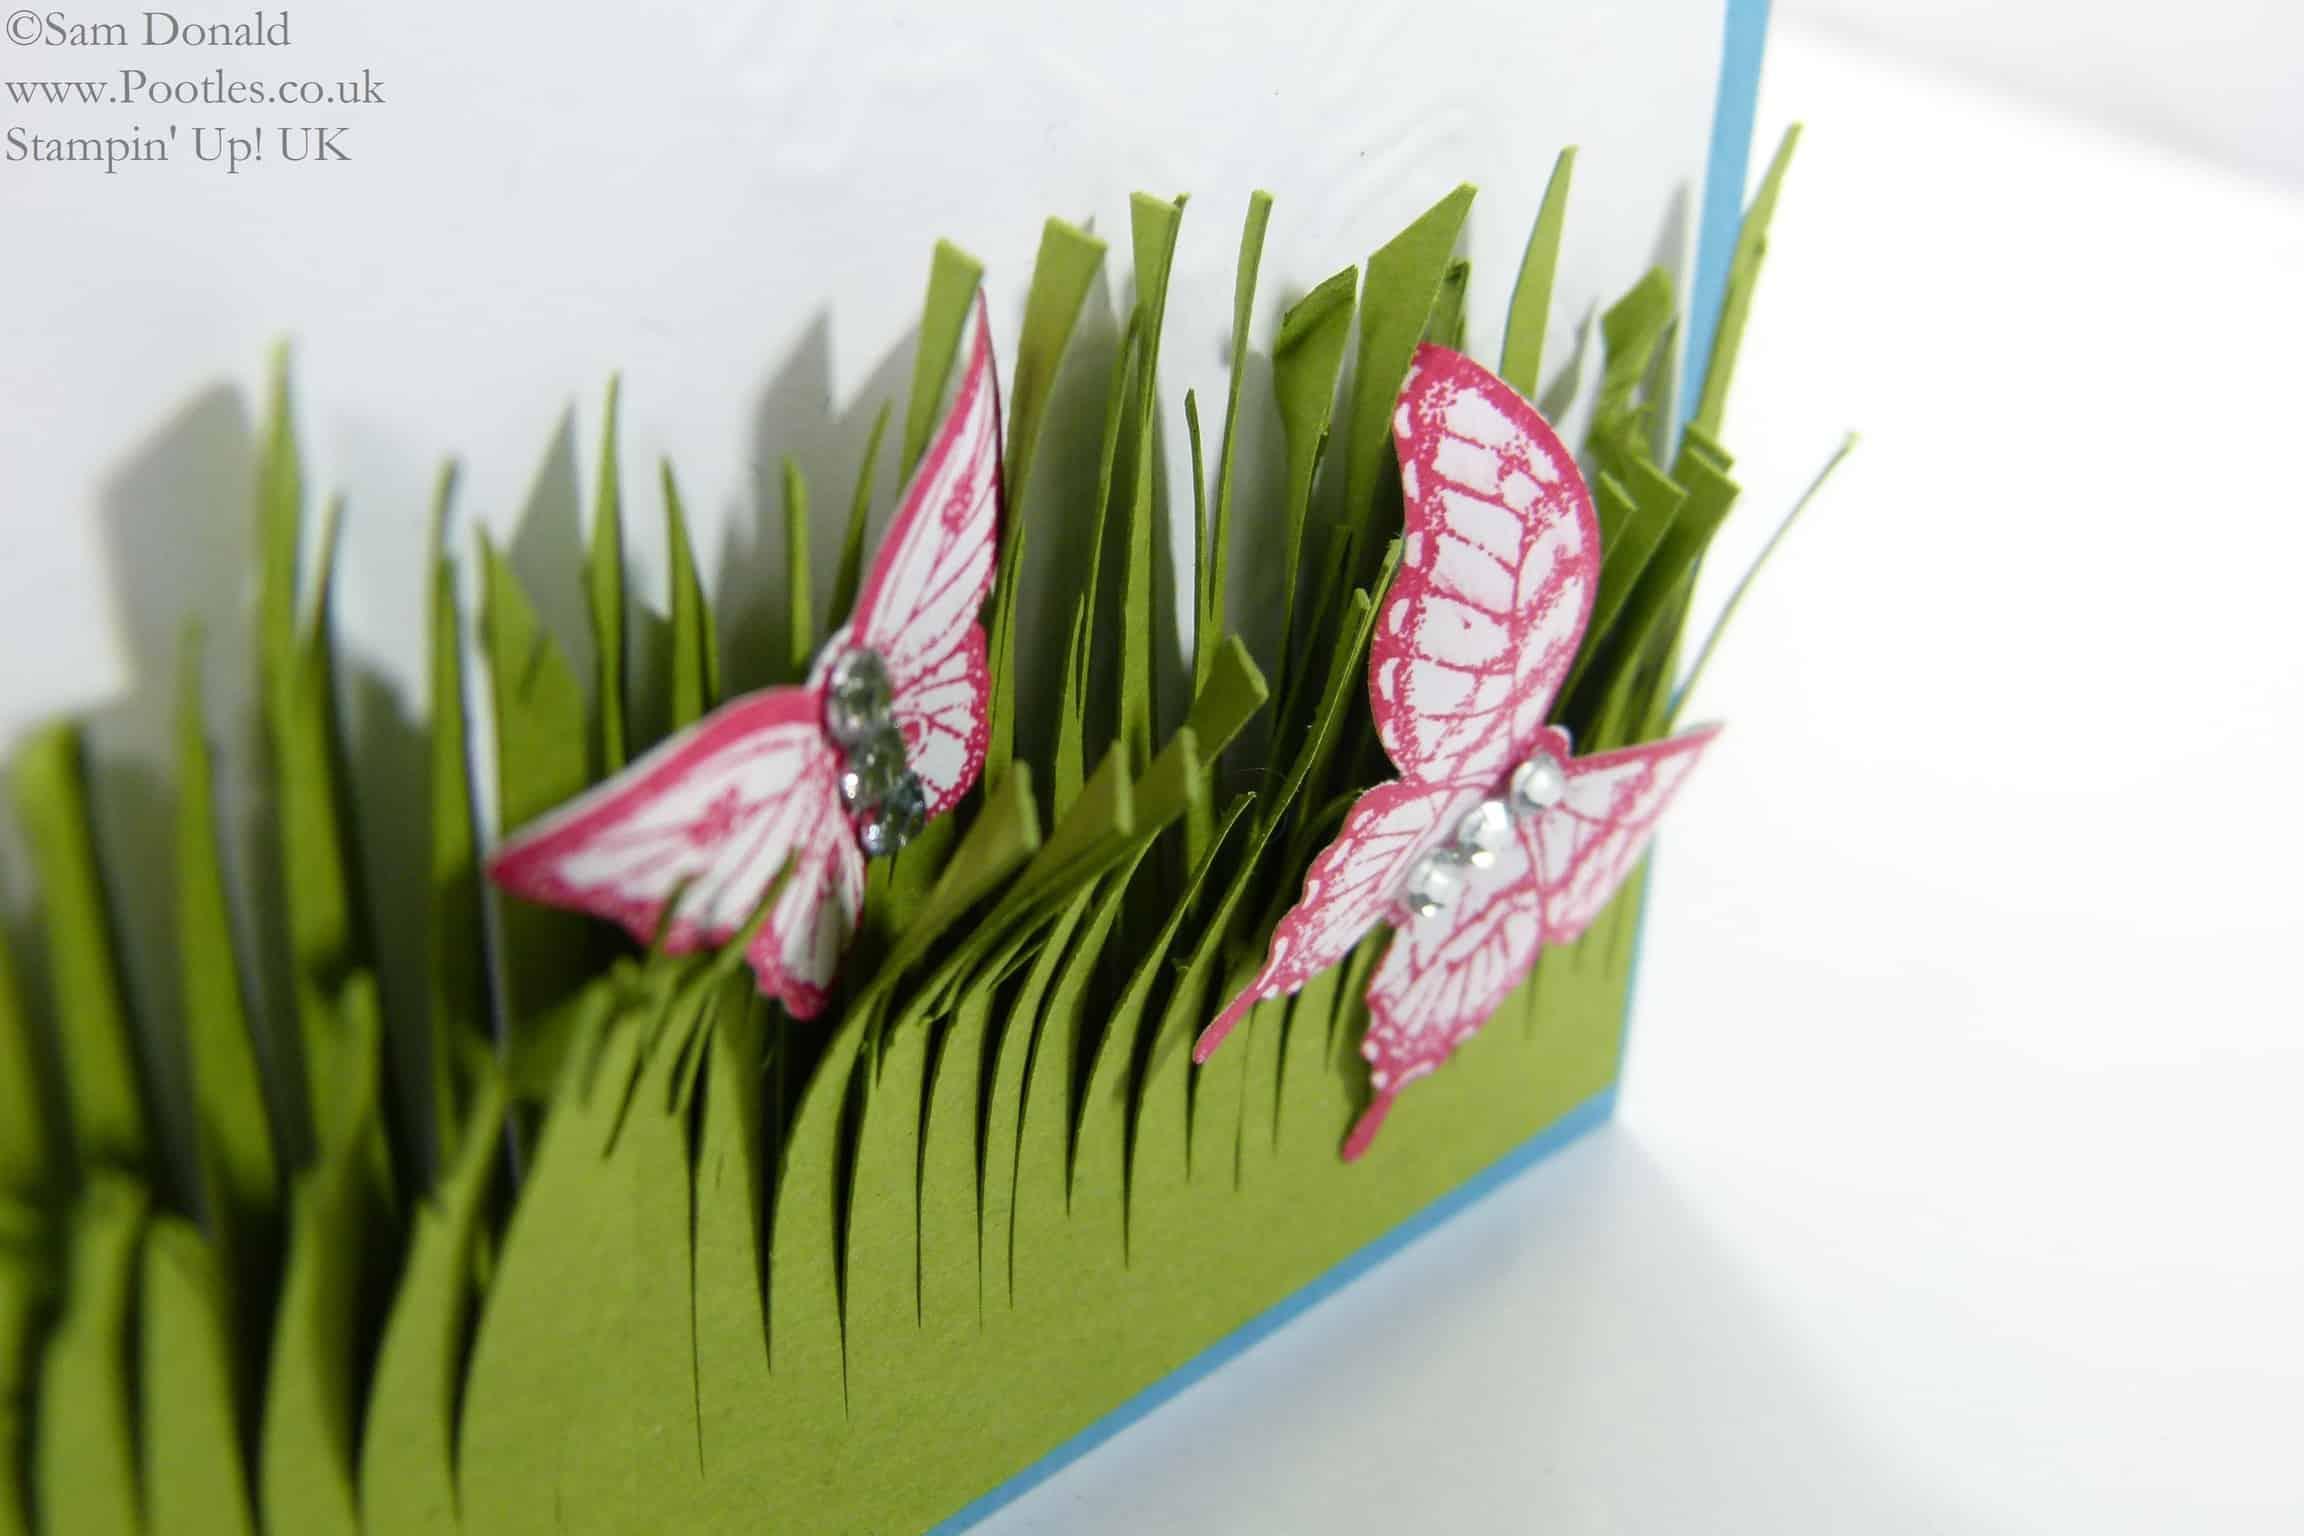 POOTLES Stampin' Up! UK Papillon Pot Pourri meets the Fringe Scissors